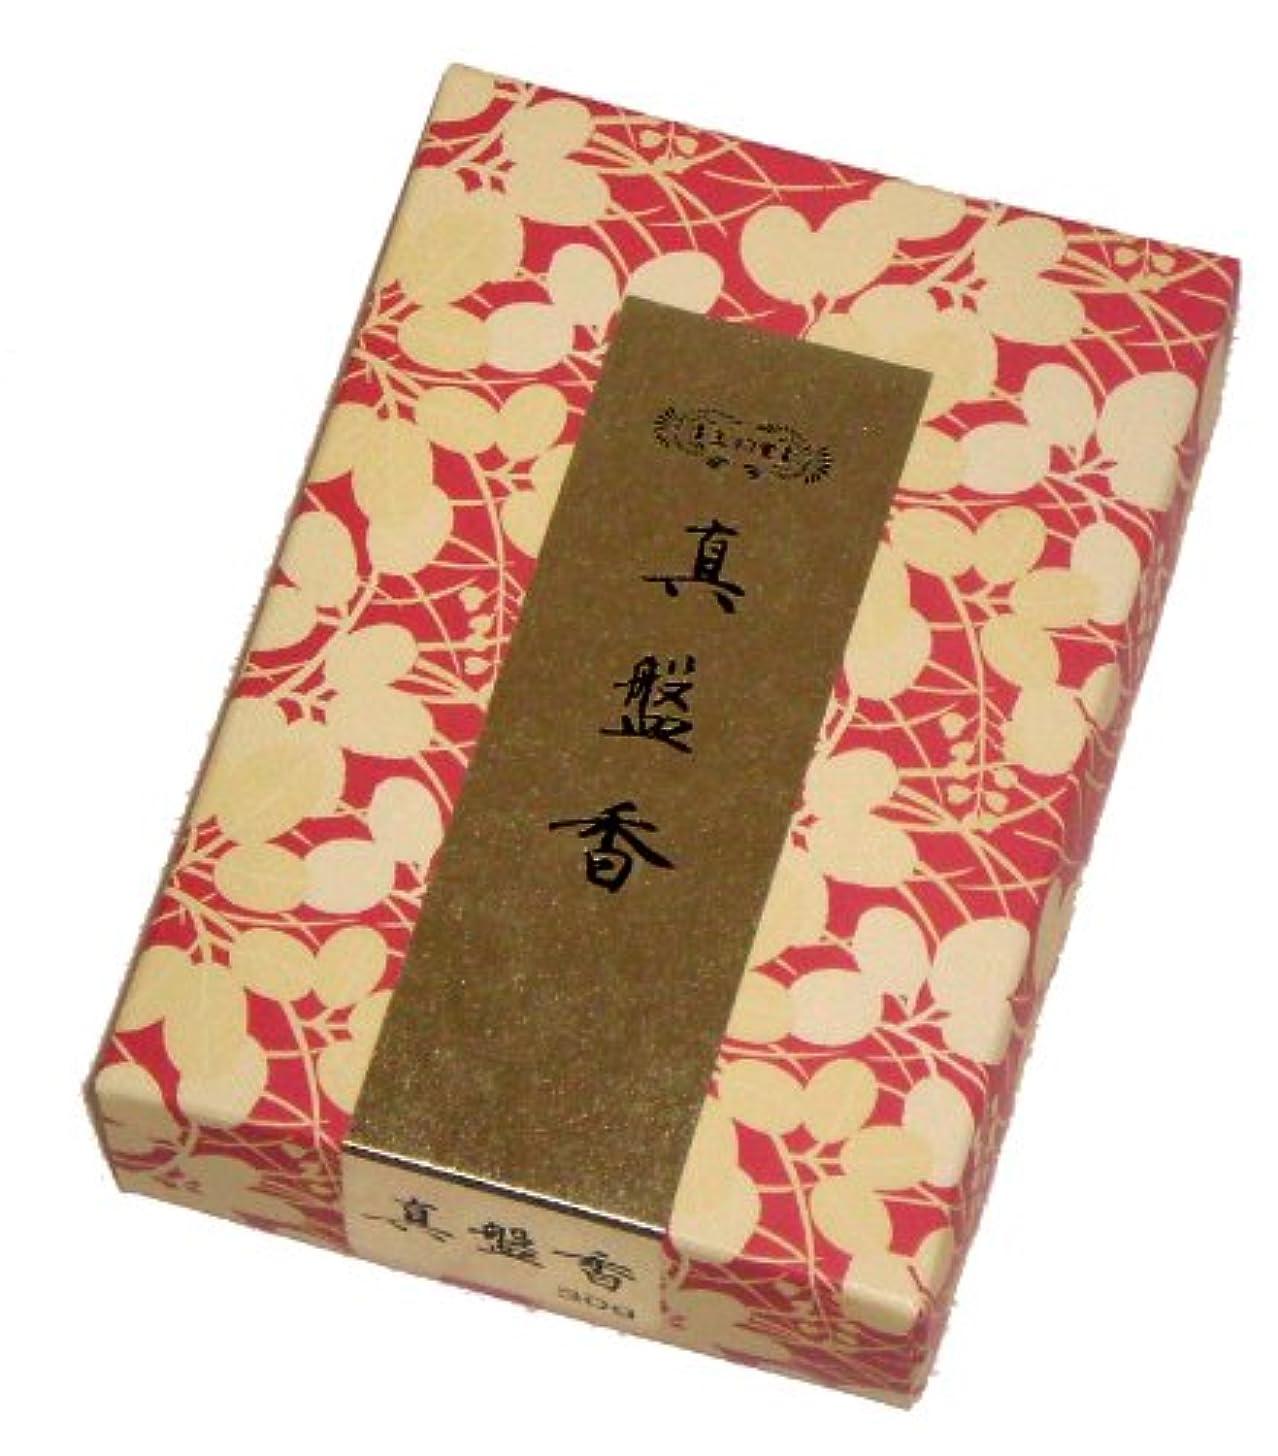 包括的文化経験玉初堂のお香 真盤香 30g #615